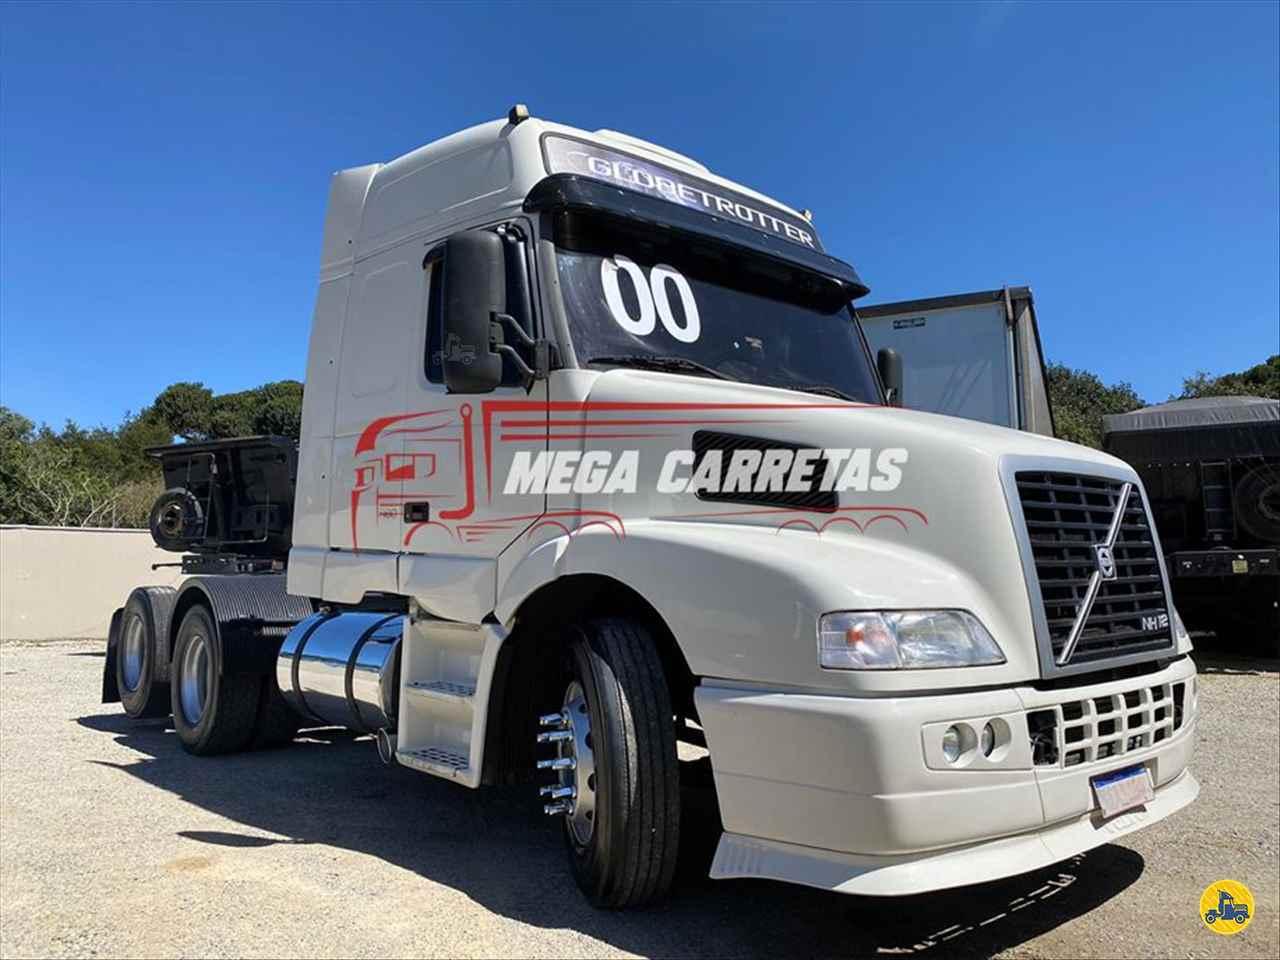 CAMINHAO VOLVO VOLVO NH12 380 Cavalo Mecânico Truck 6x2 Mega Carretas COLOMBO PARANÁ PR